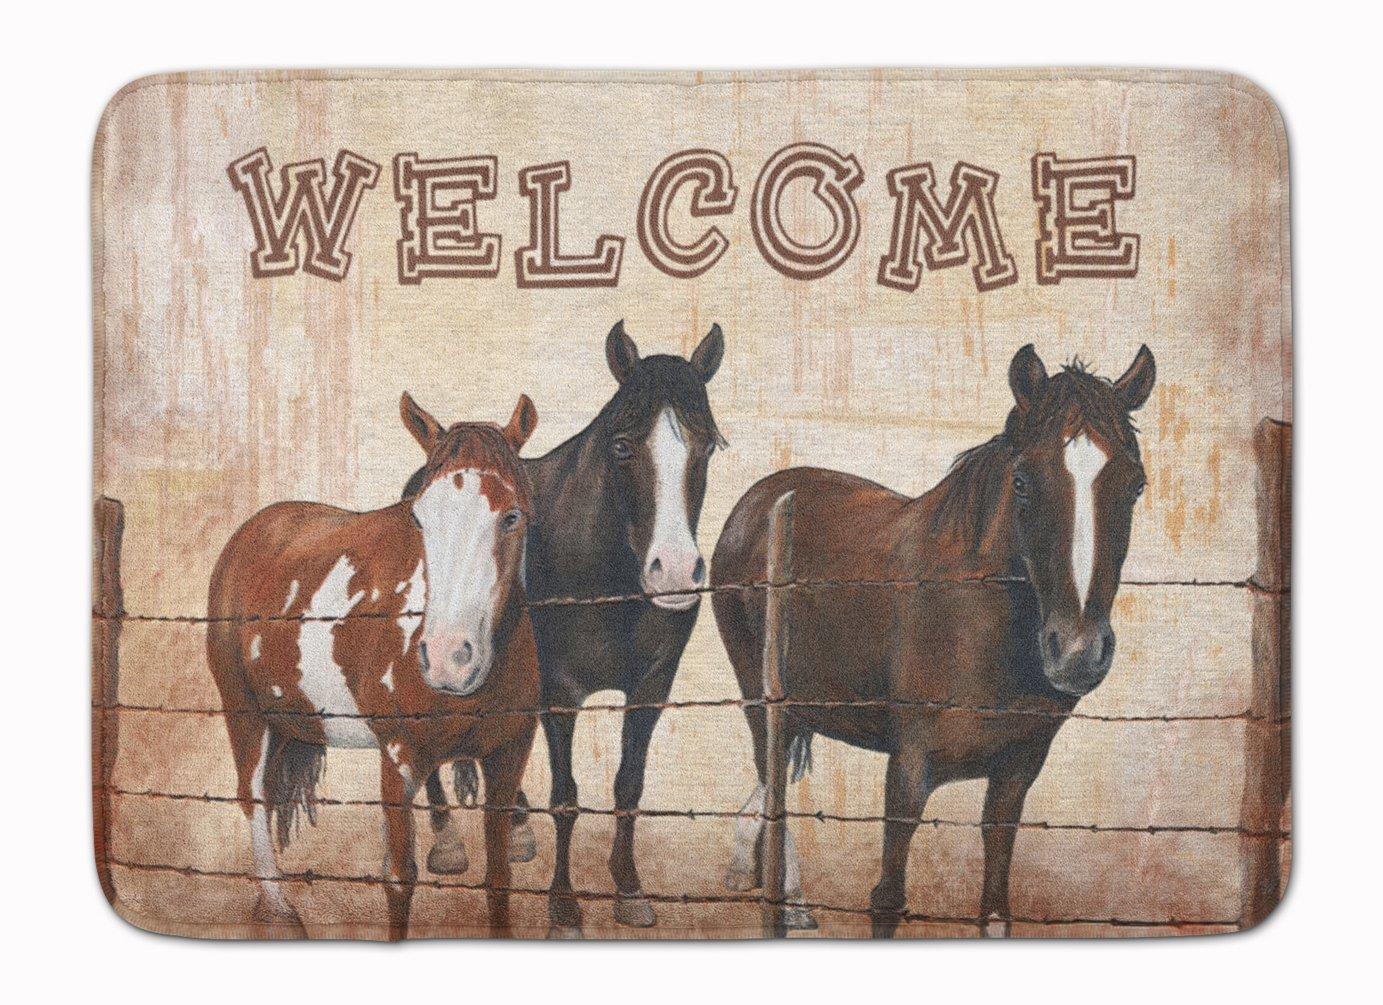 Caroline's Treasures Welcome Horses Floor Mat, 19' x 27' Multicolor